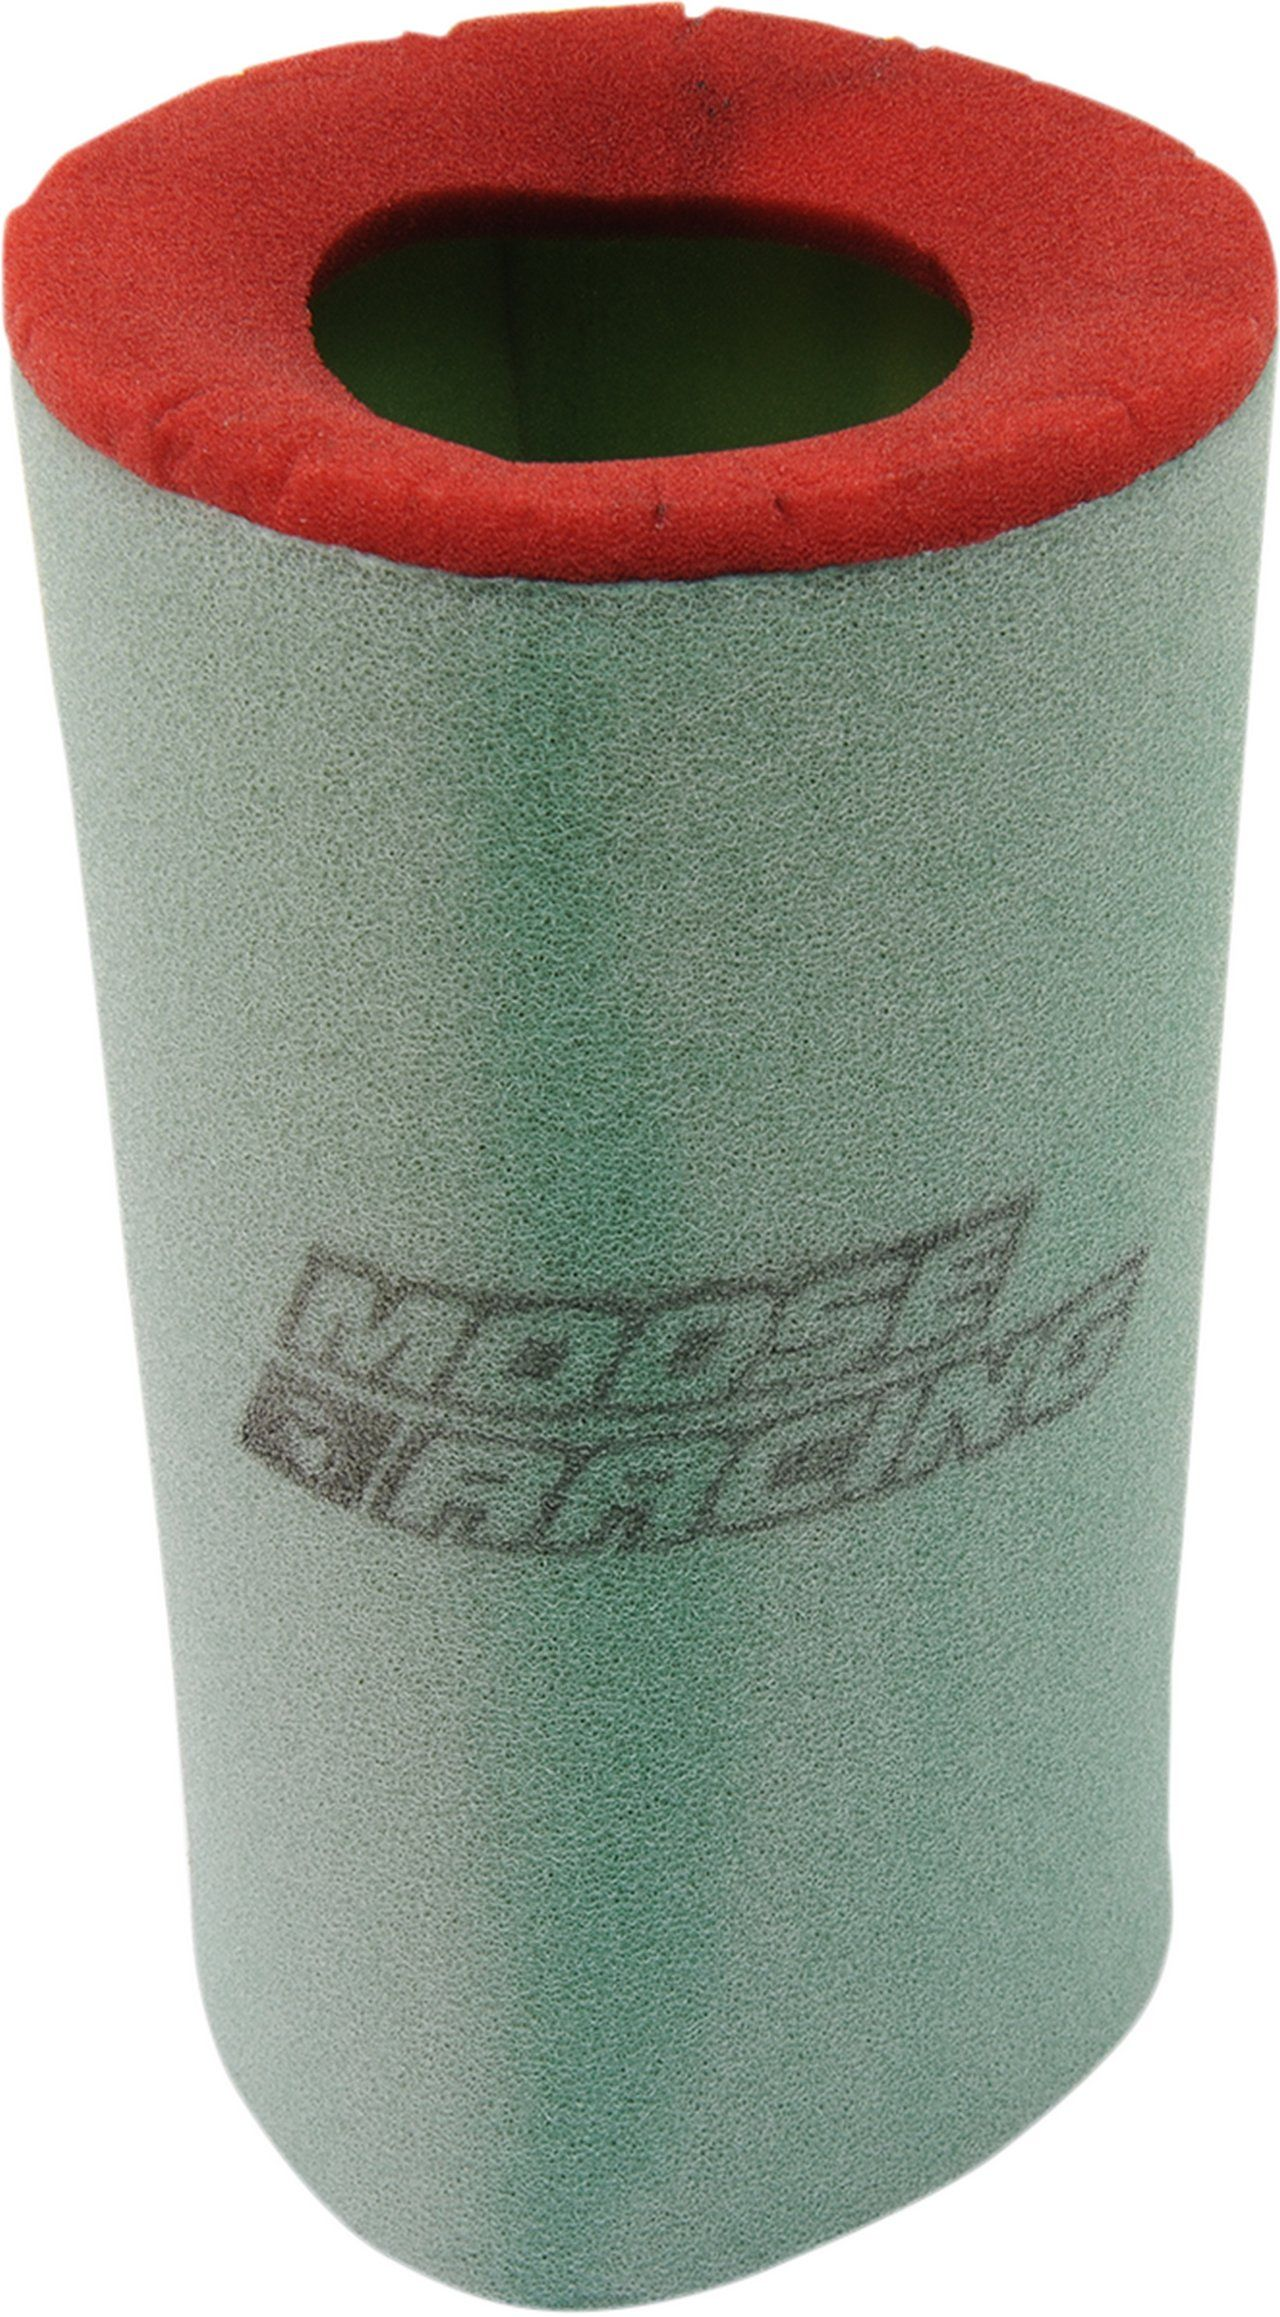 【MOOSE RACING】PPO (PRECISION PRE-OILED) 空氣濾芯 [1011-3724] - 「Webike-摩托百貨」